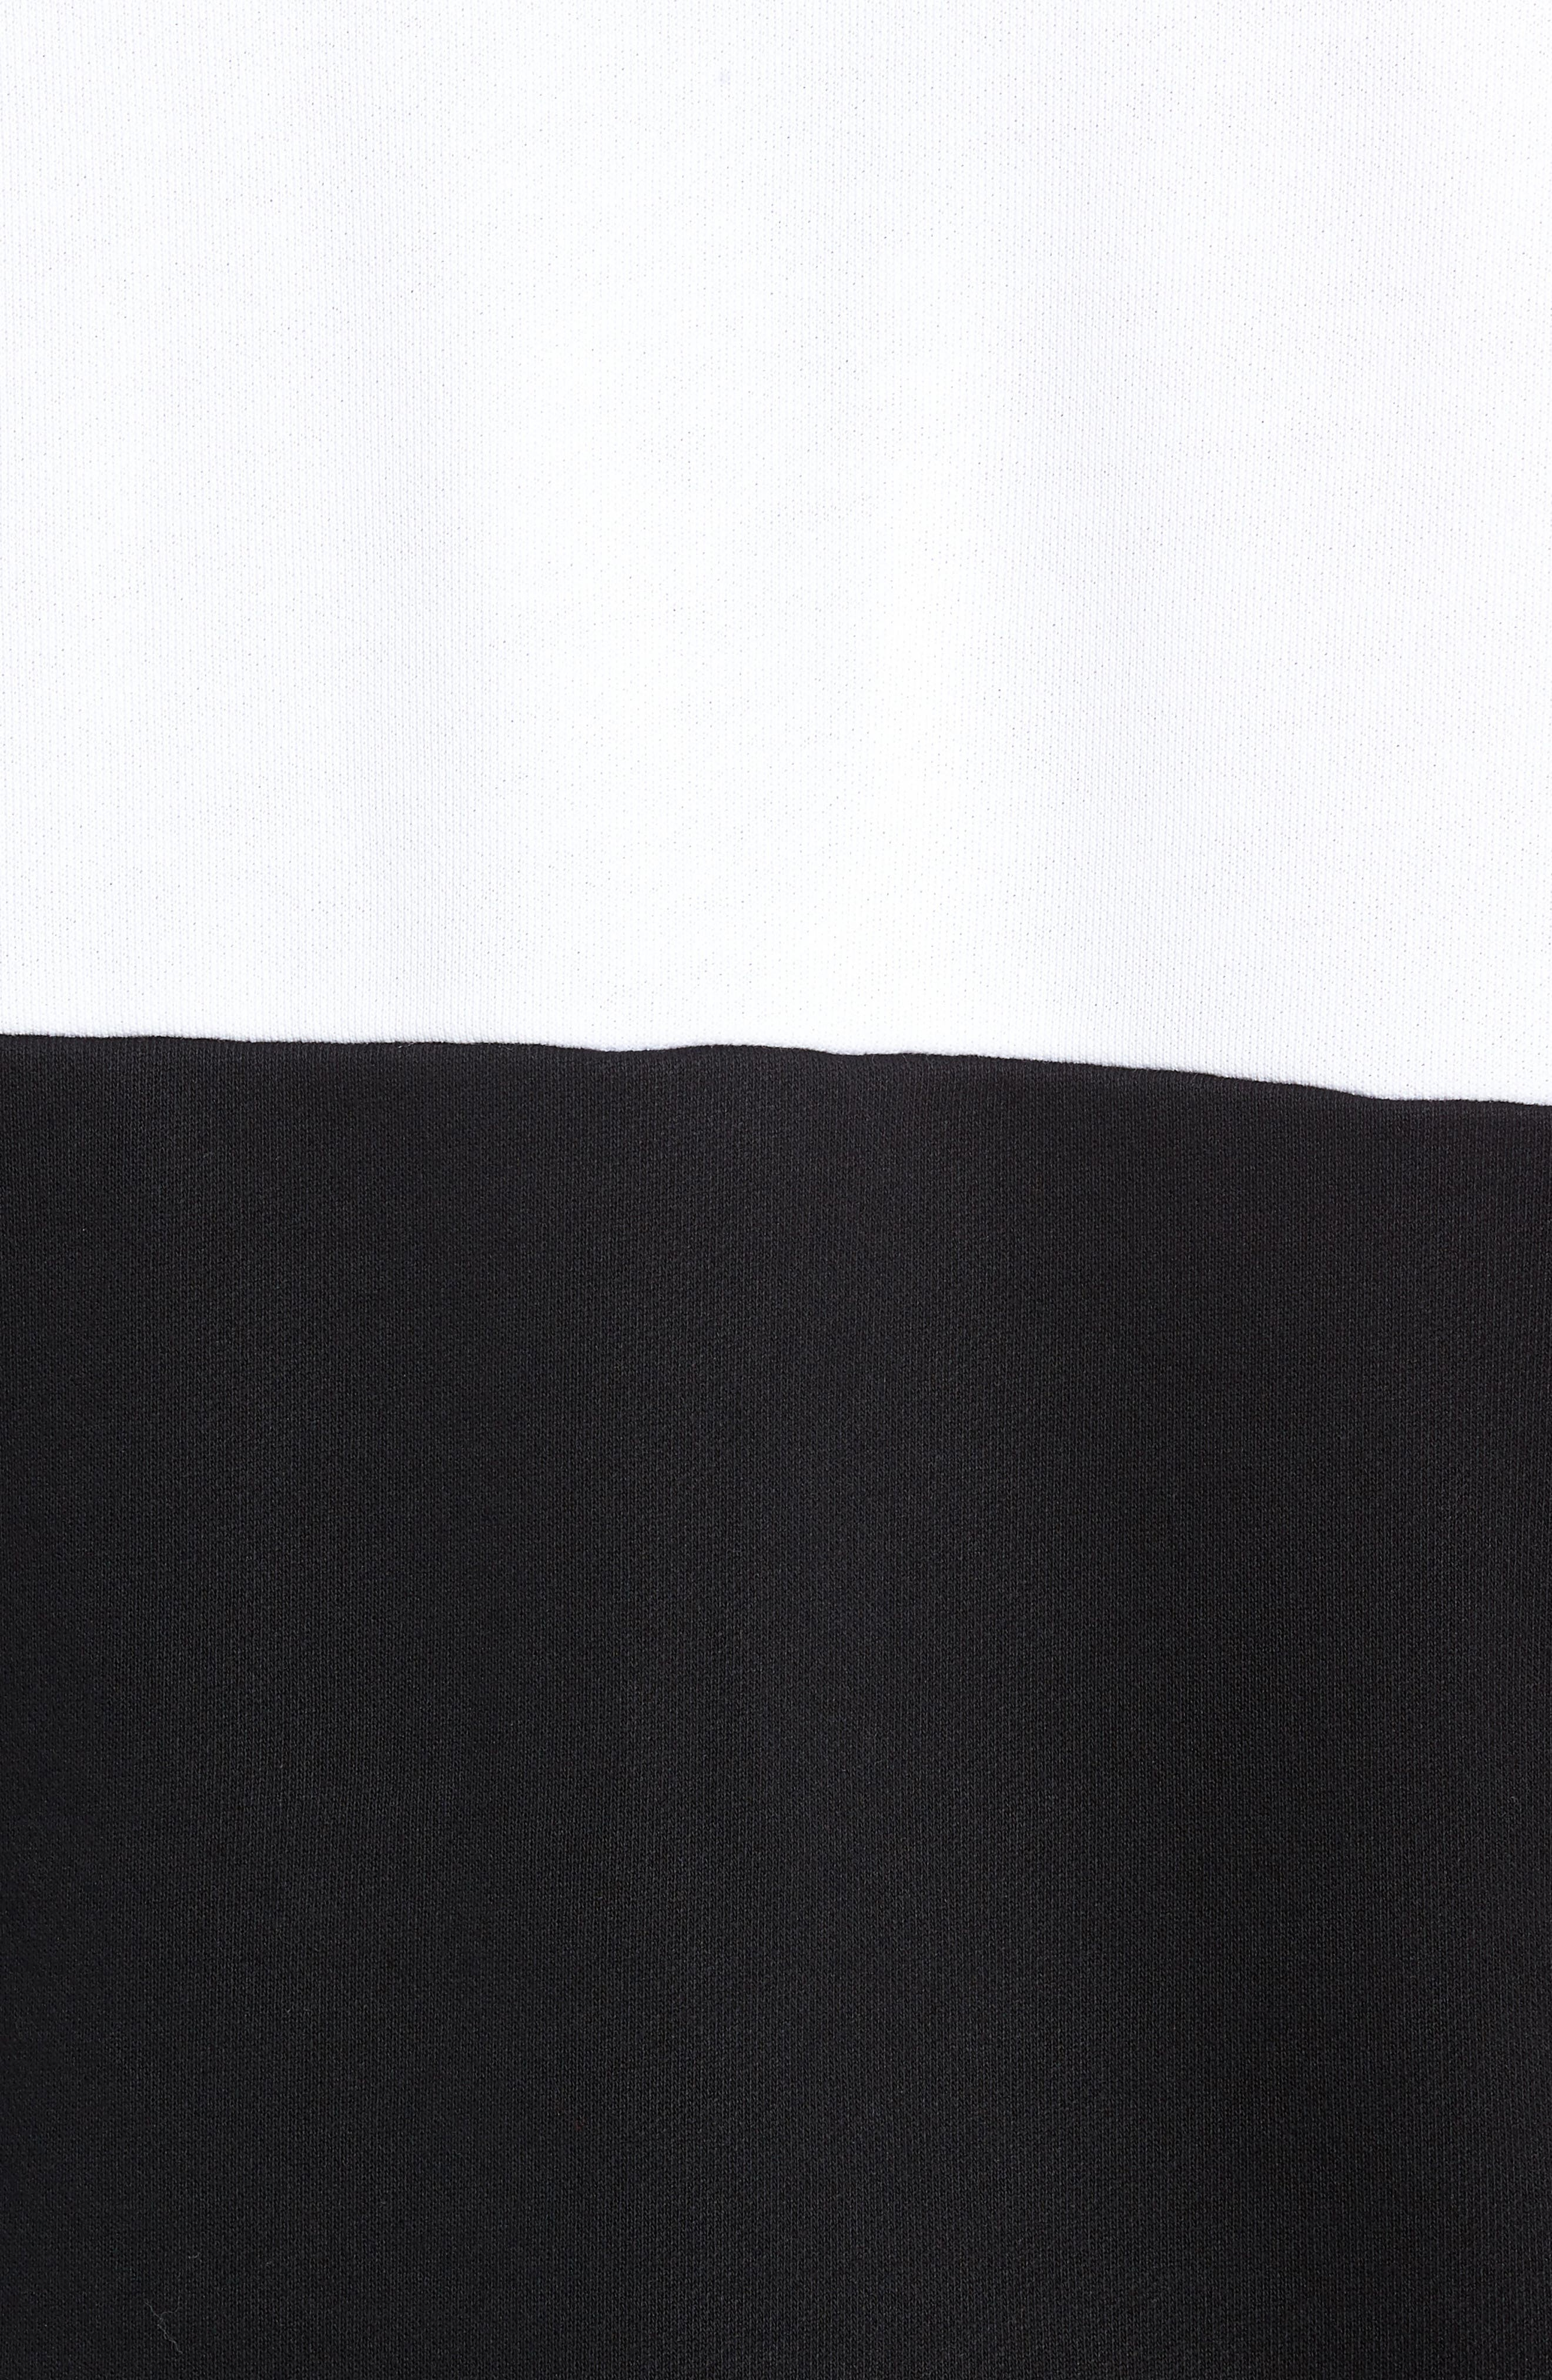 Libe Core Colorblock Sweatshirt,                             Alternate thumbnail 5, color,                             001